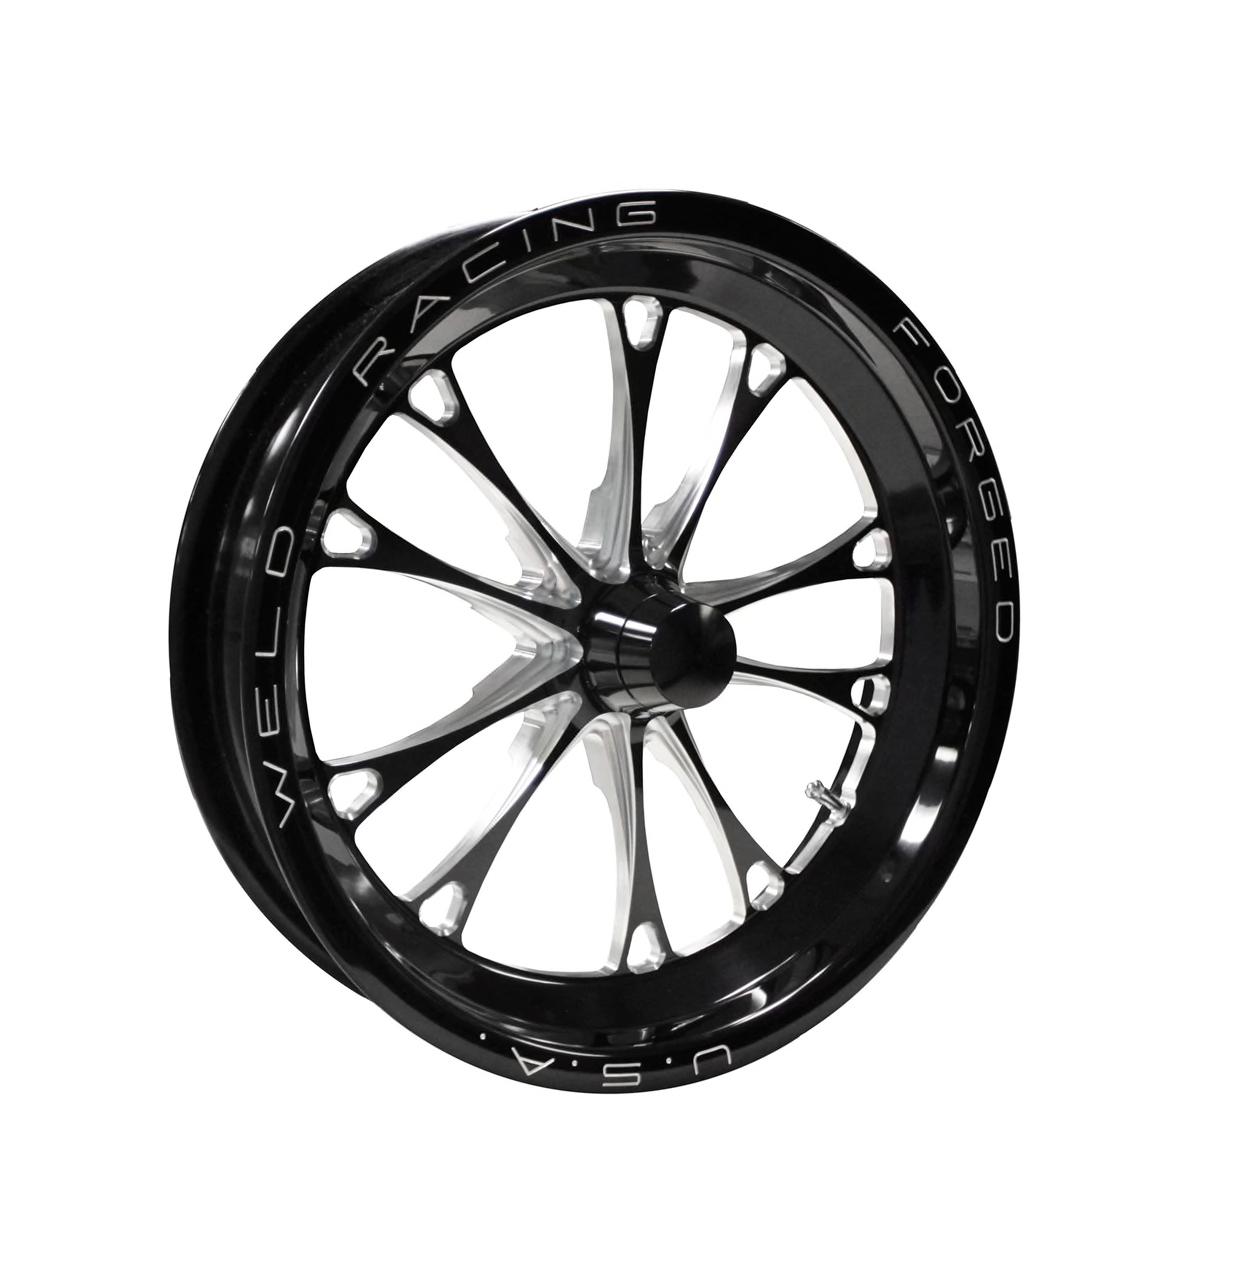 For Toyota FJ Cruiser 07-14 Gas Cap Race Style Locking Flat Black Ring /& Black